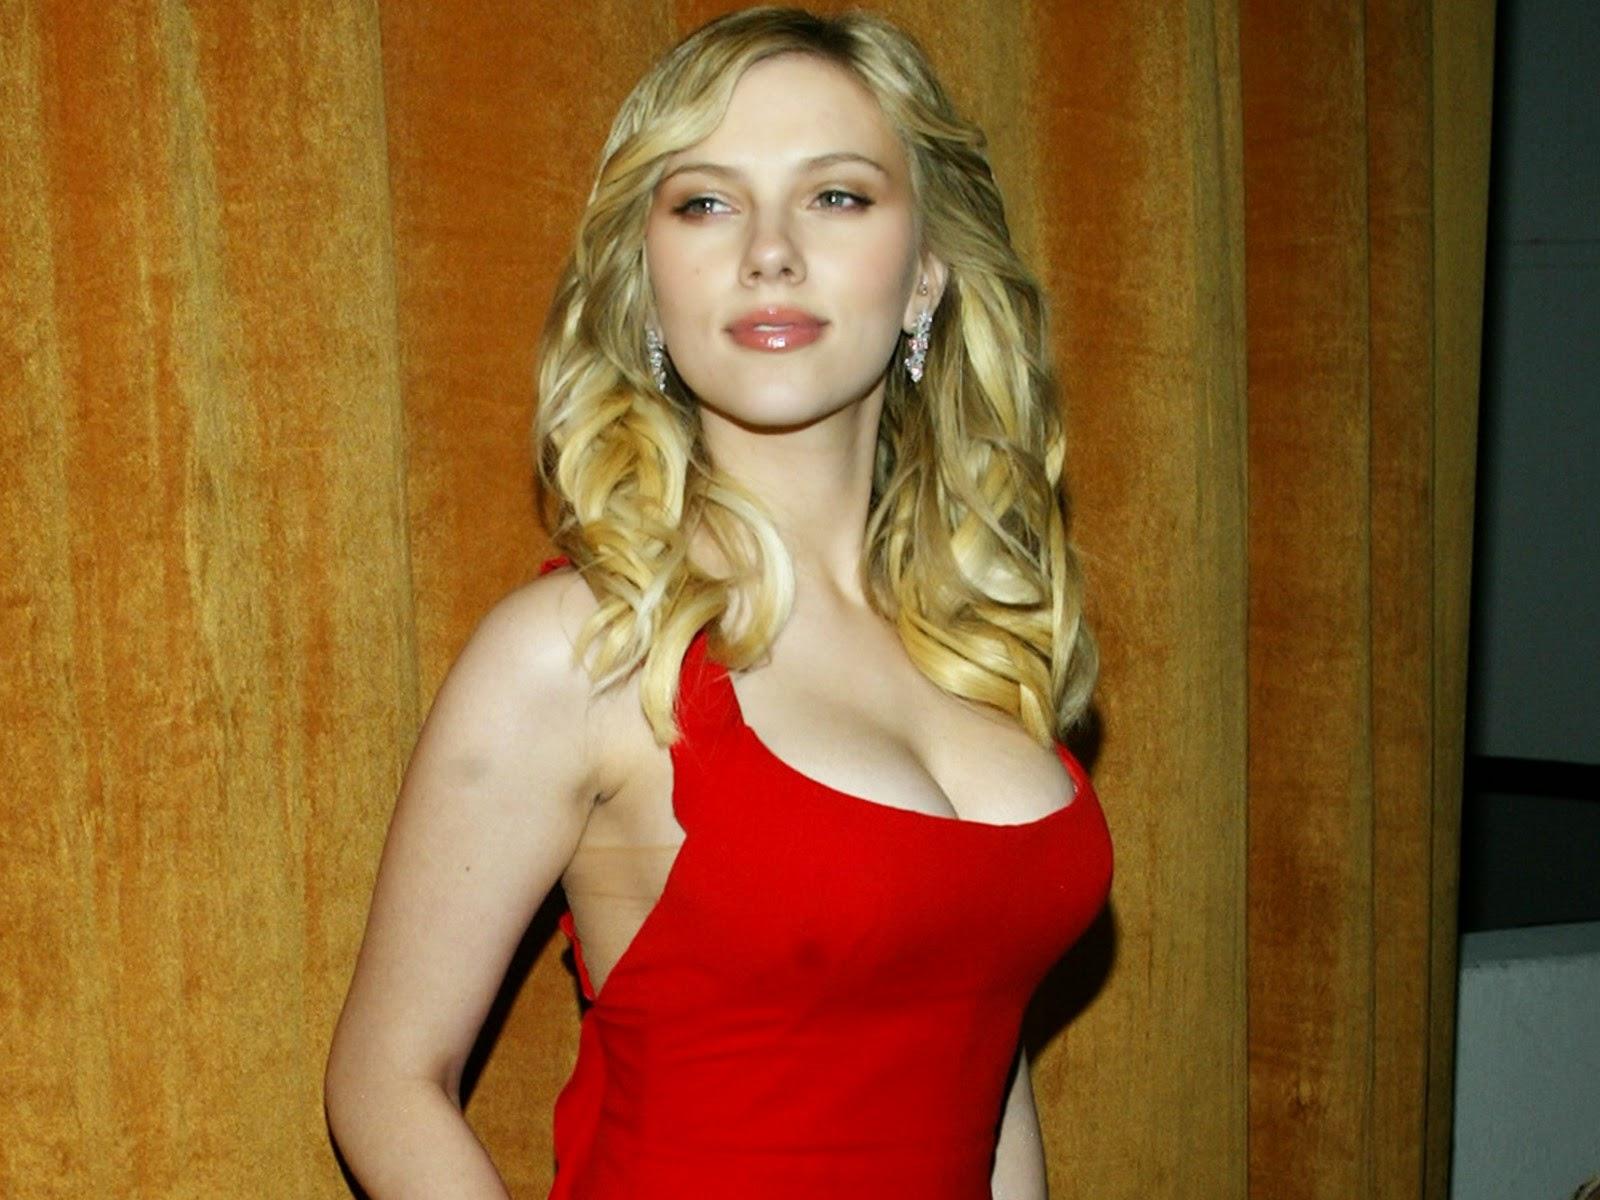 Scarlett johansson nude self pics